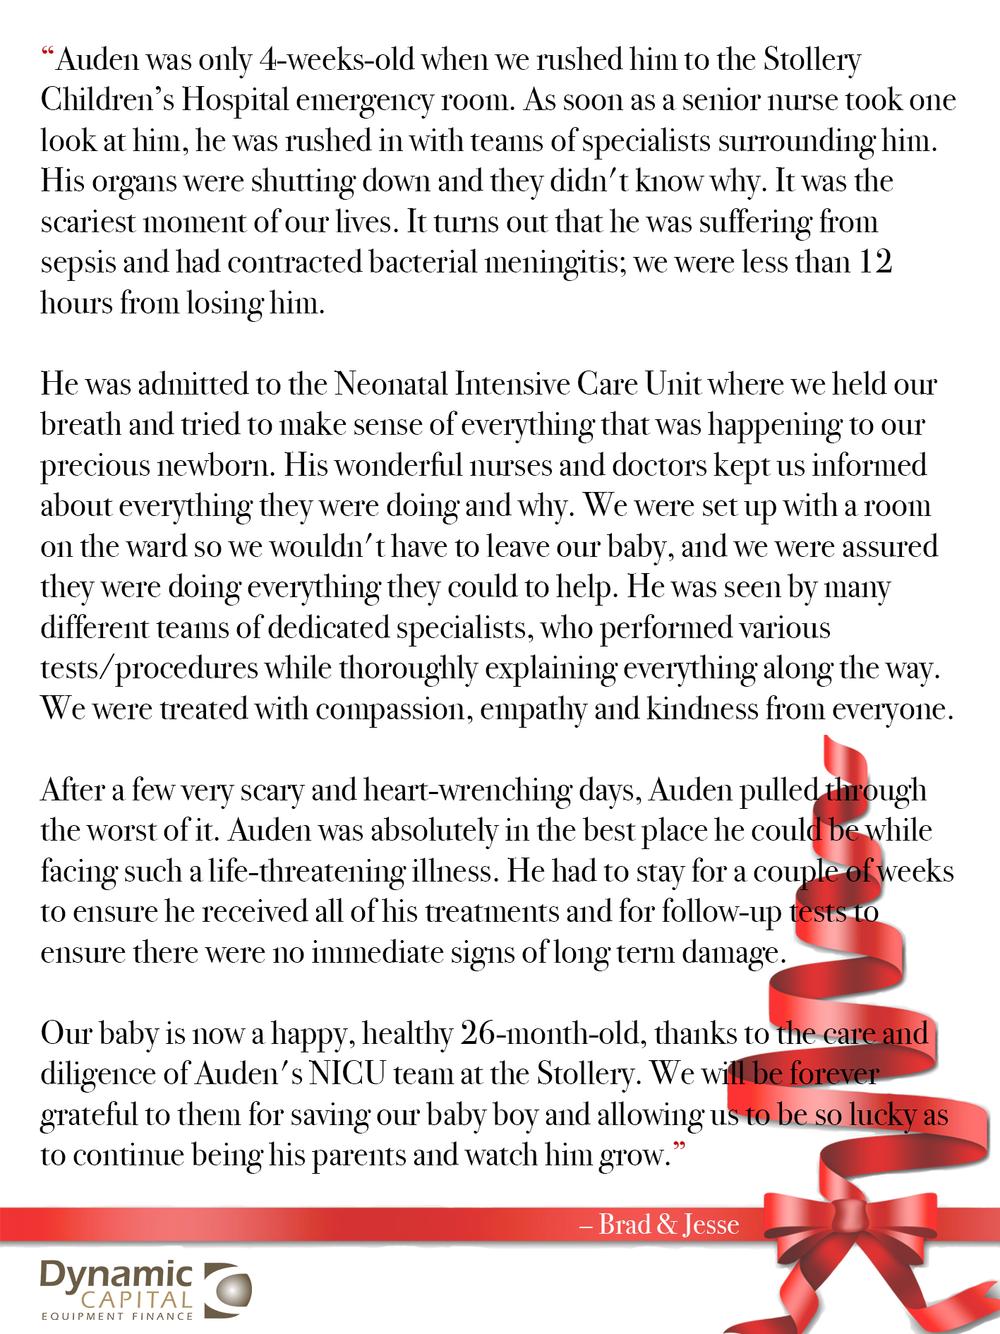 Auden's Story.png